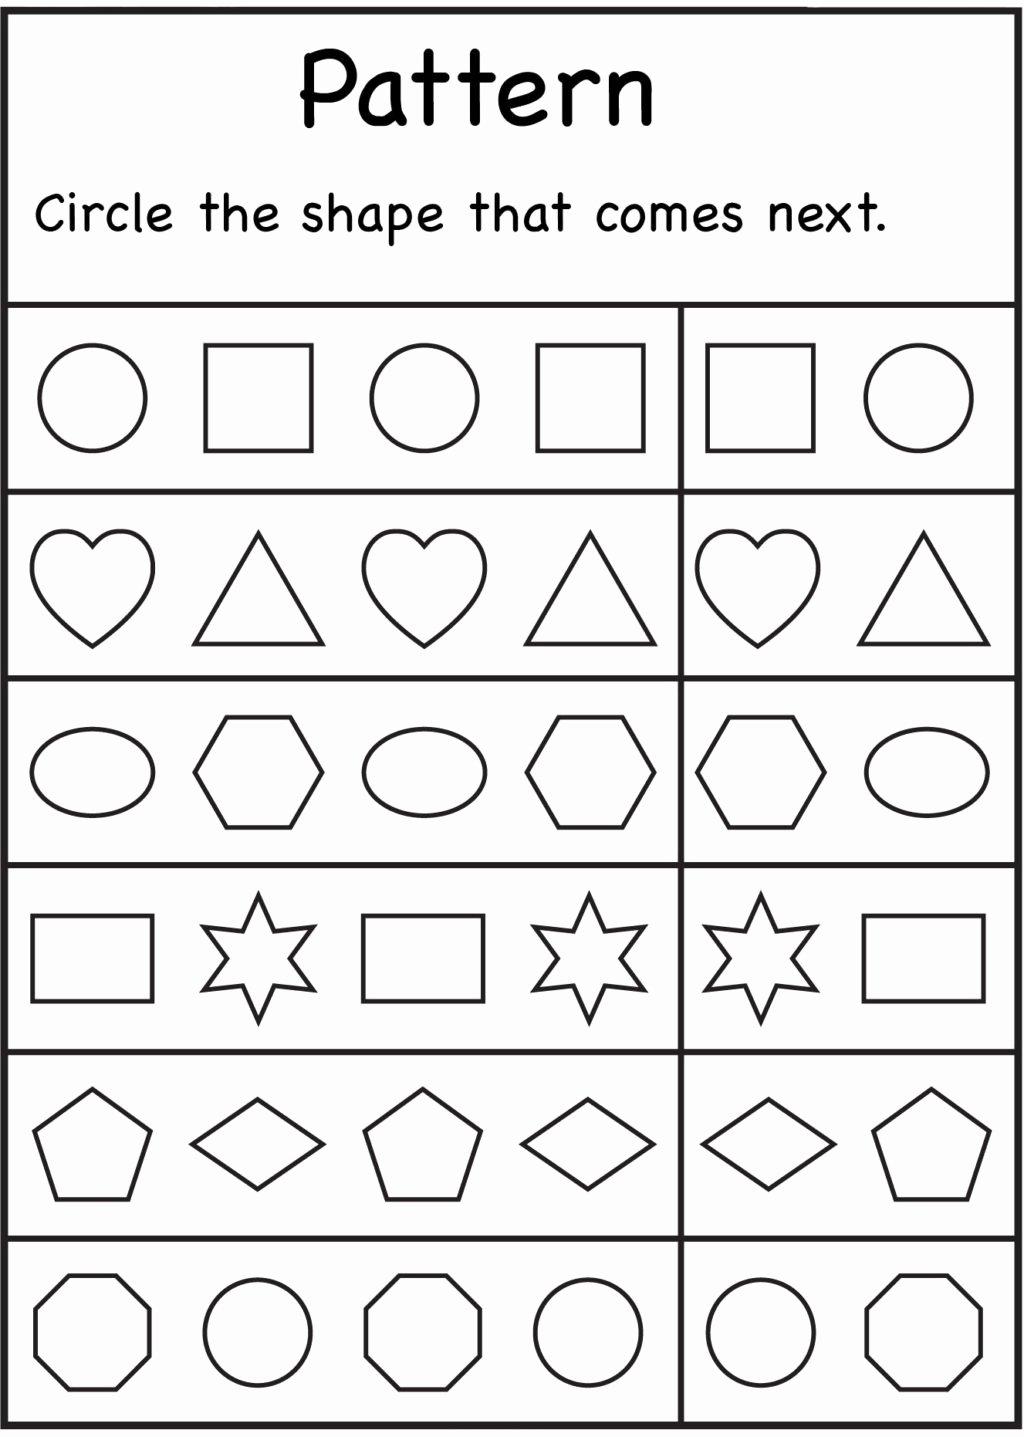 What Comes Next Worksheets for Preschoolers Best Of Worksheet Worksheet Kindergarten Worksheets Math Preschool